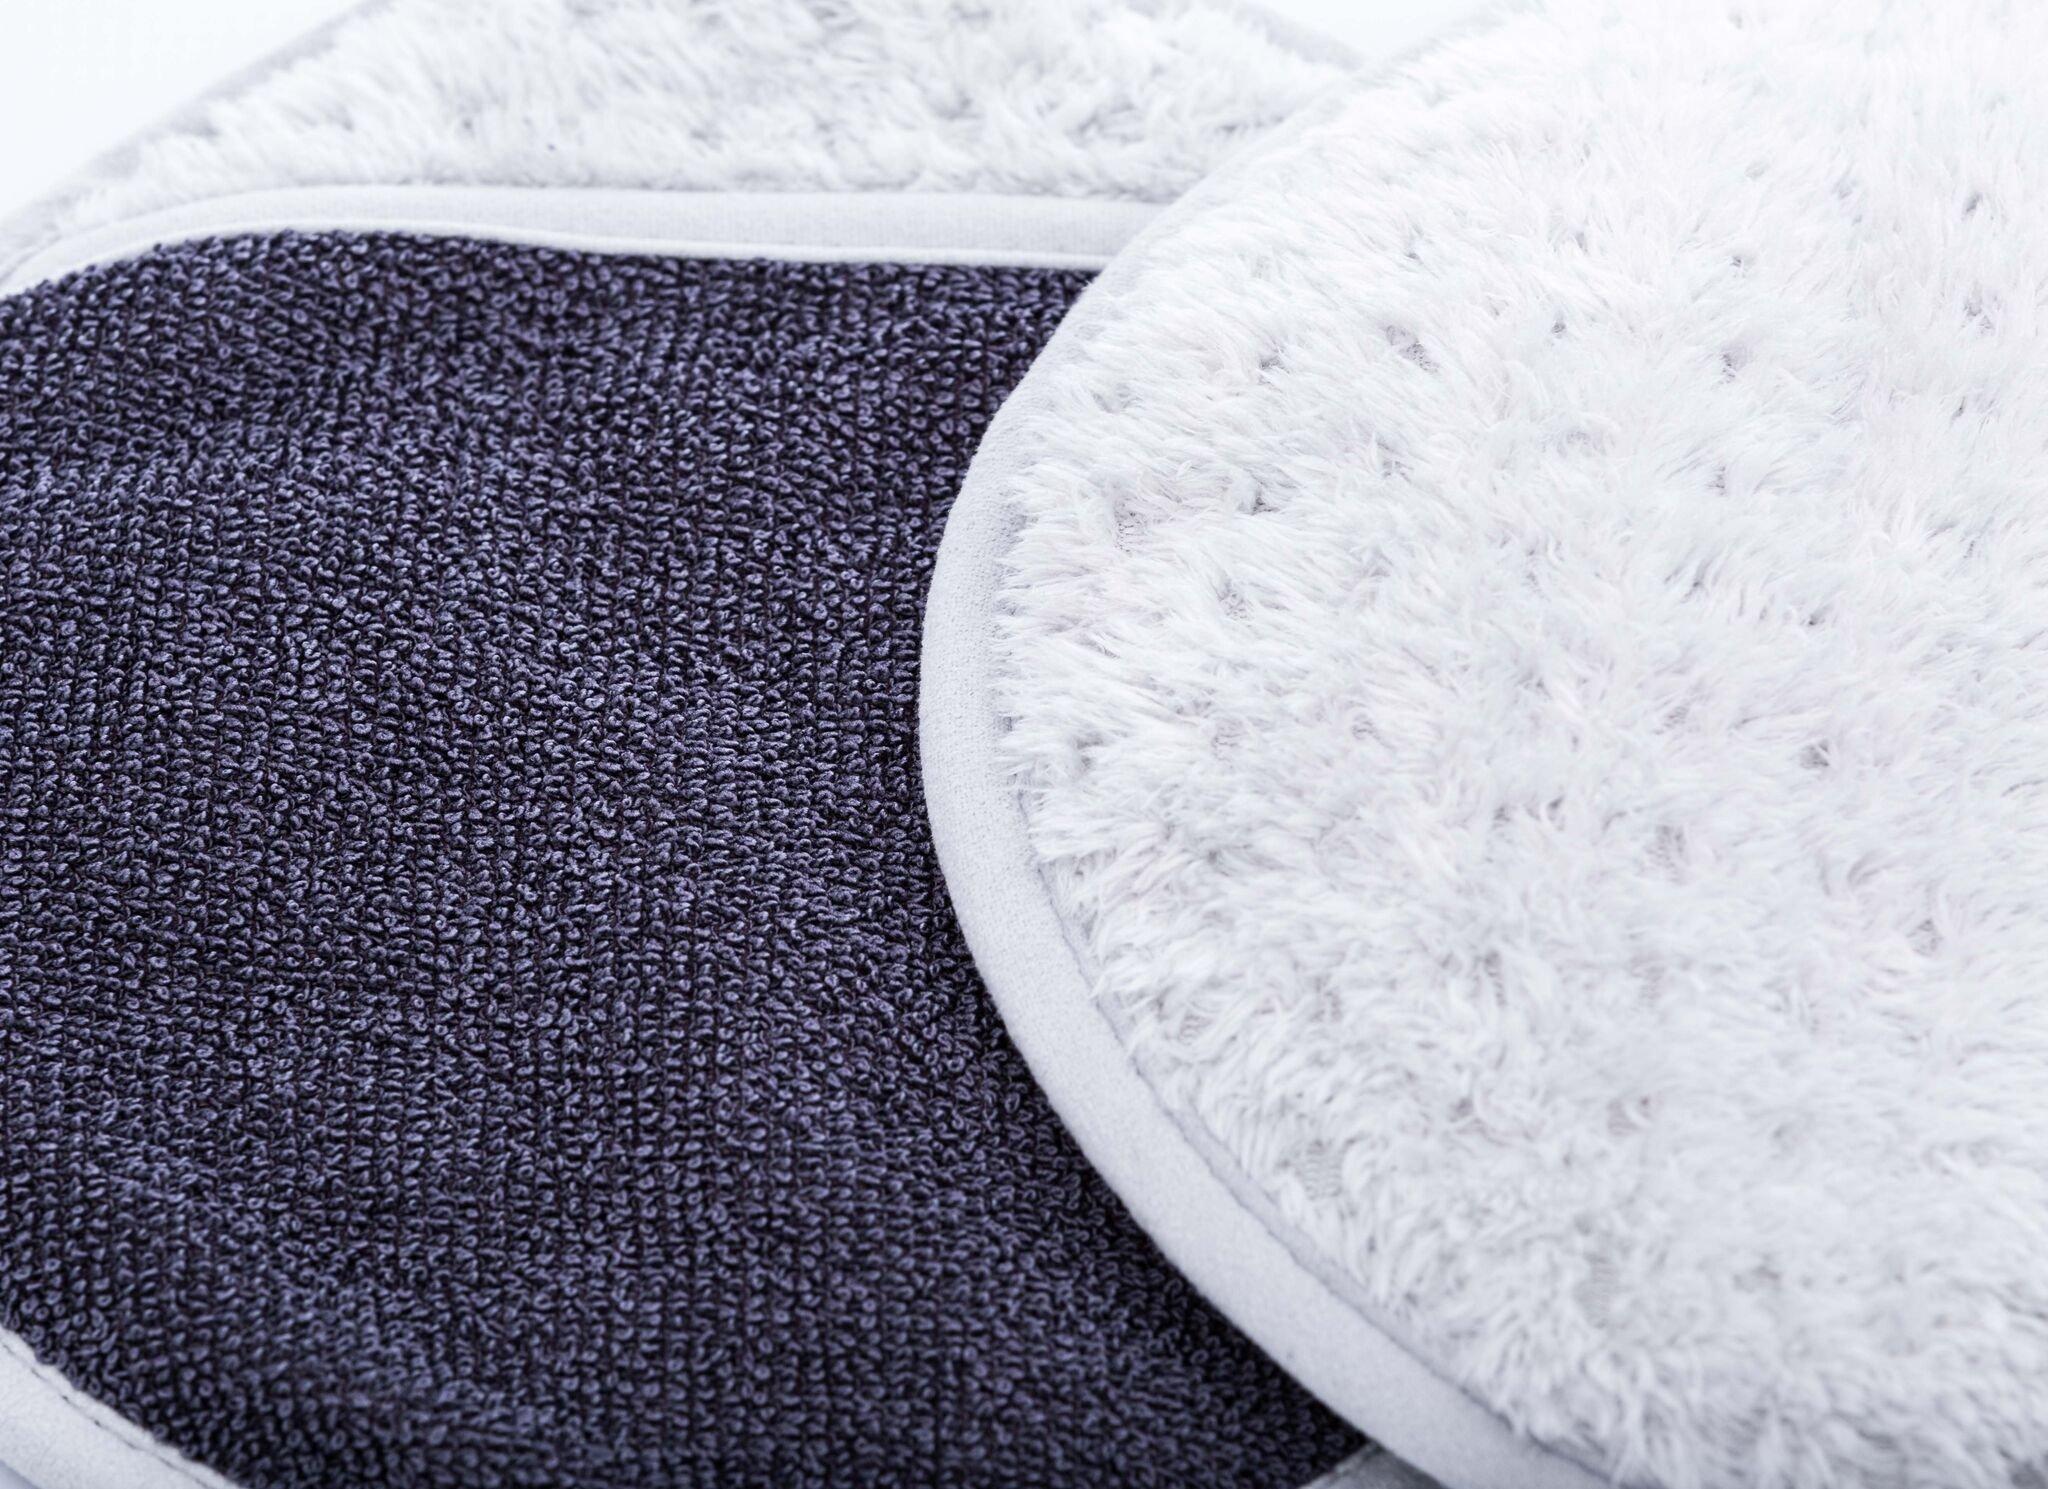 THE RAG COMPANY (2-Pack) 25 in. x 36 in. TWIST N' SHOUT Professional Korean 70/30 550gsm Twist Loop Microfiber Drying Towel & SMITTEN Dry Mitt Combo